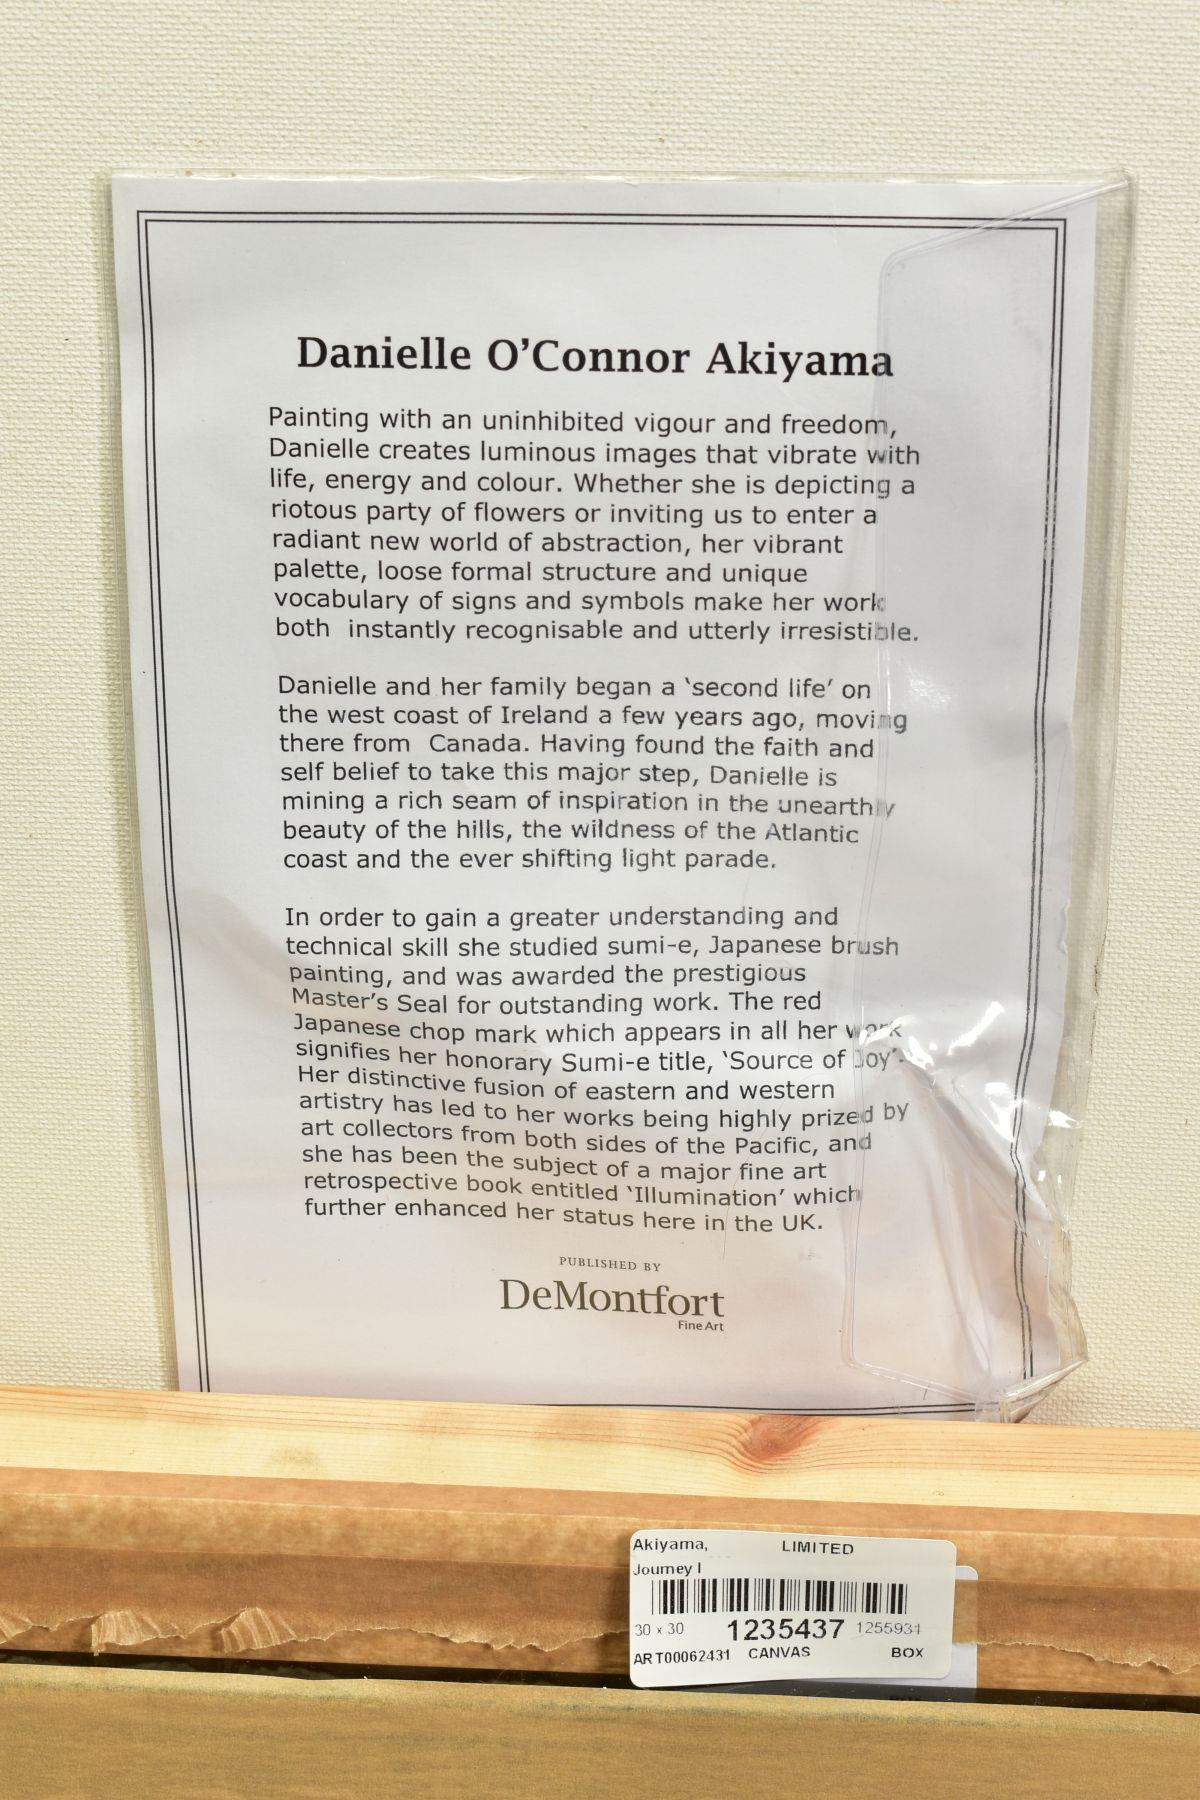 DANIELLE O'CONNOR AKIYAMA (CANADA 1957), 'Journey I', a Limited Edition print of blossom, 36/195, - Image 5 of 5